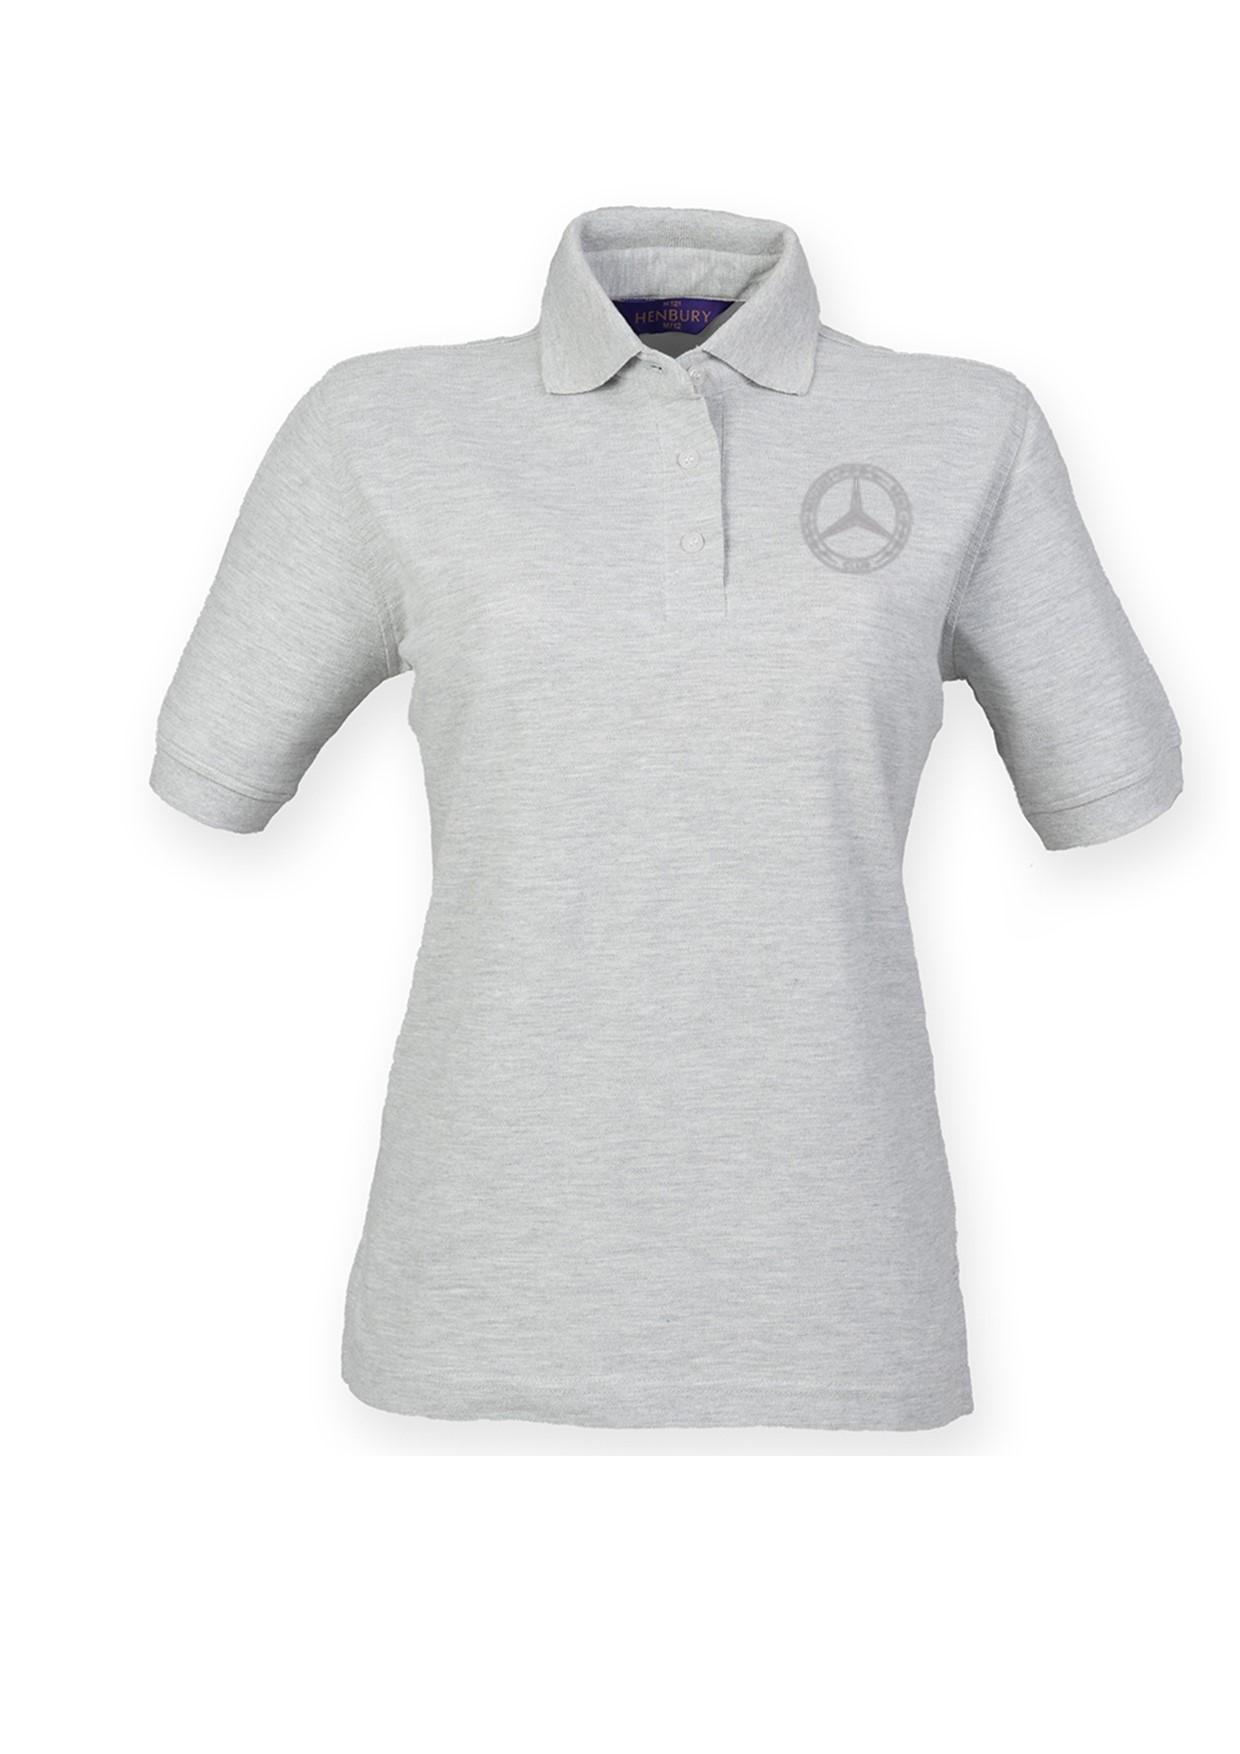 Mercedes-Benz Club Ladies Poly/Cotton Pique Polo Shirt Heather Grey